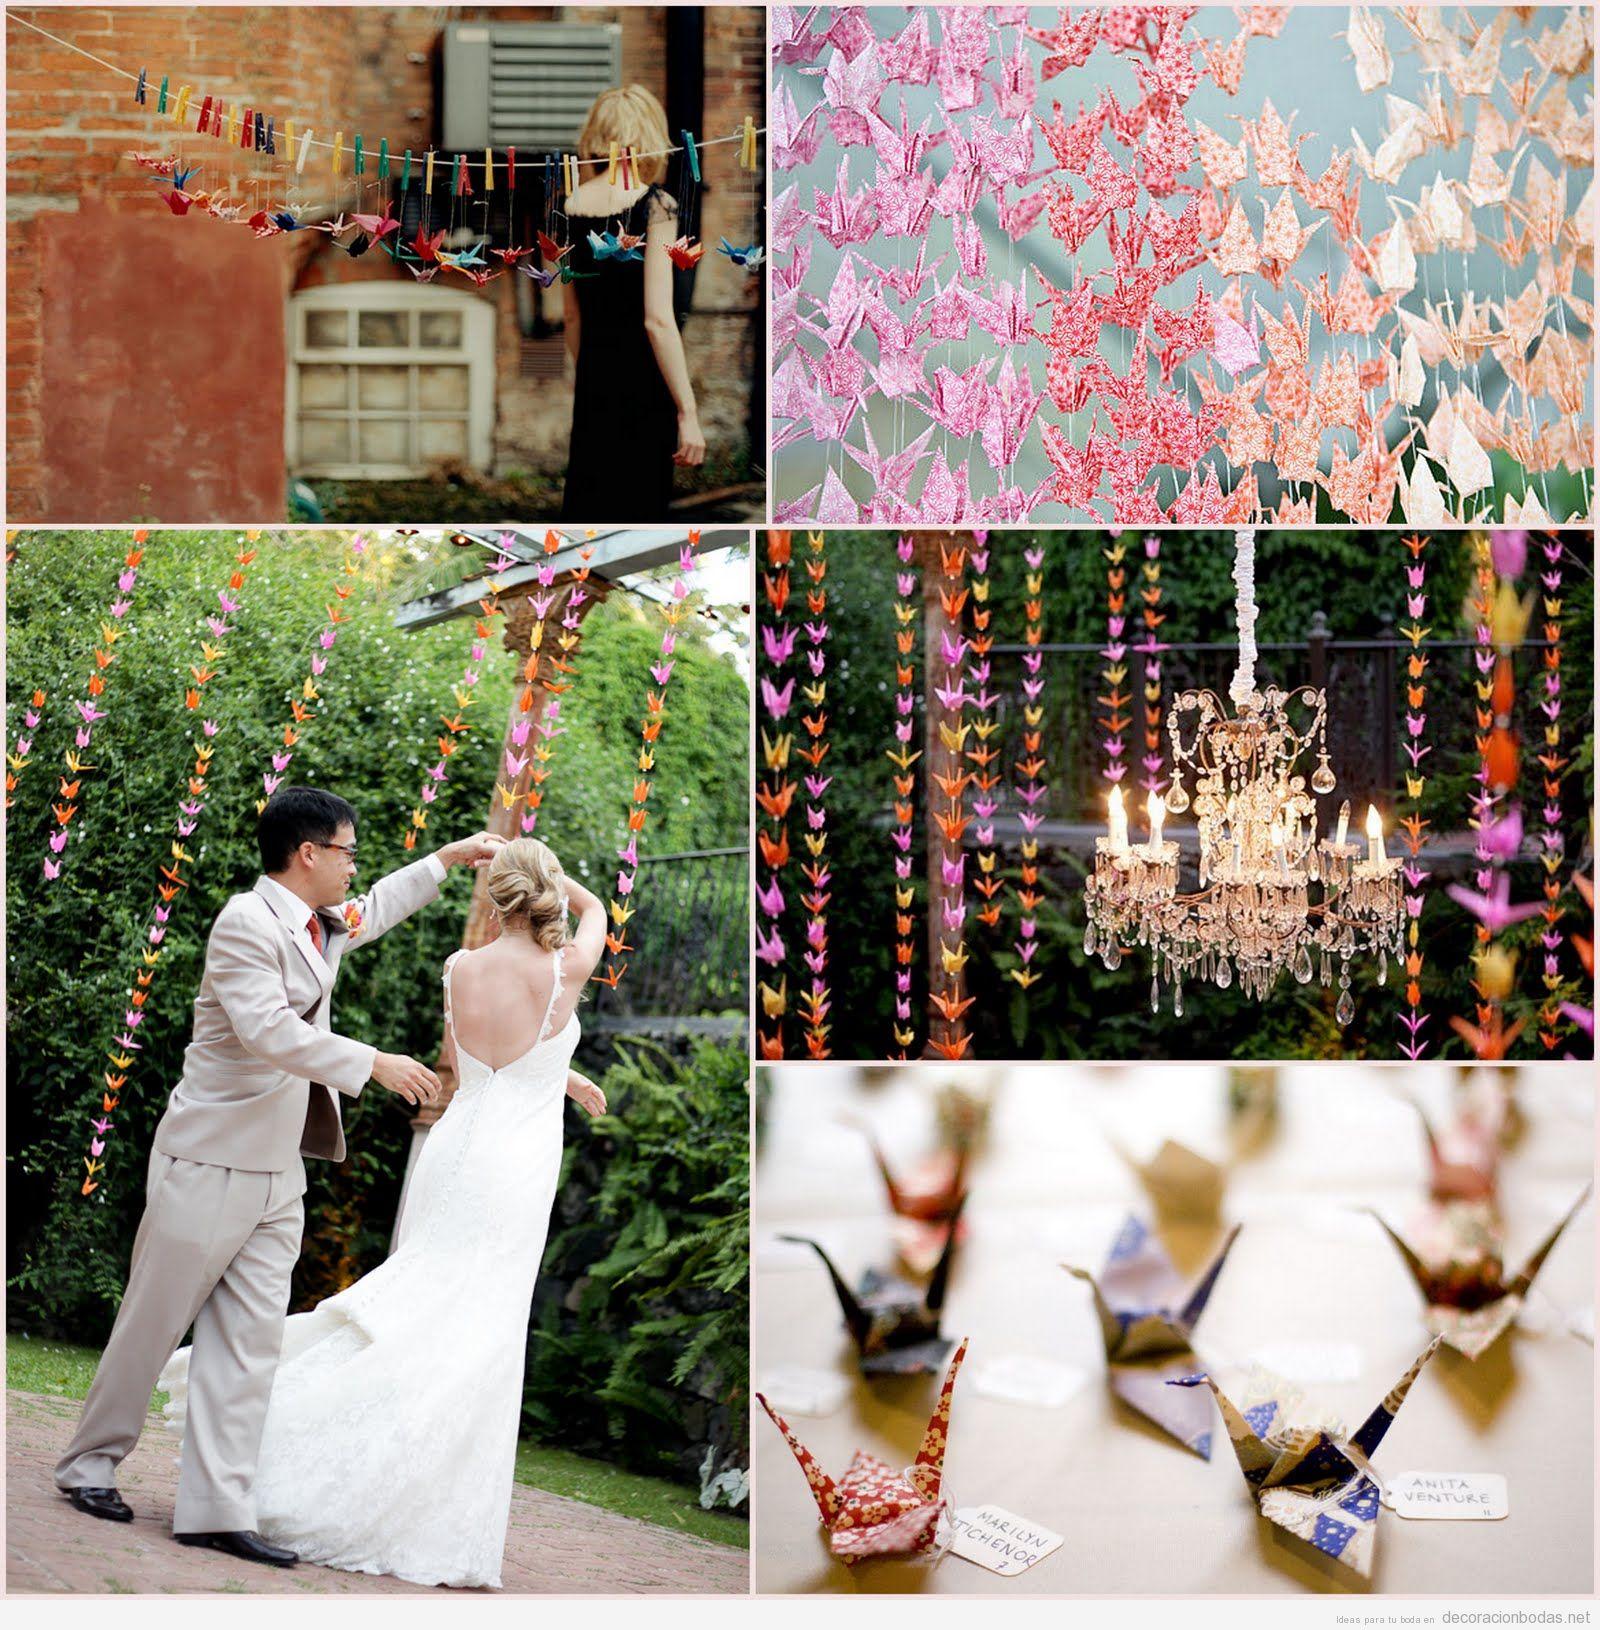 Ideas Decorar Diy Boda ~   diy etiquetado decoraci?n bodas diy guirnaldas ideas boda ideas